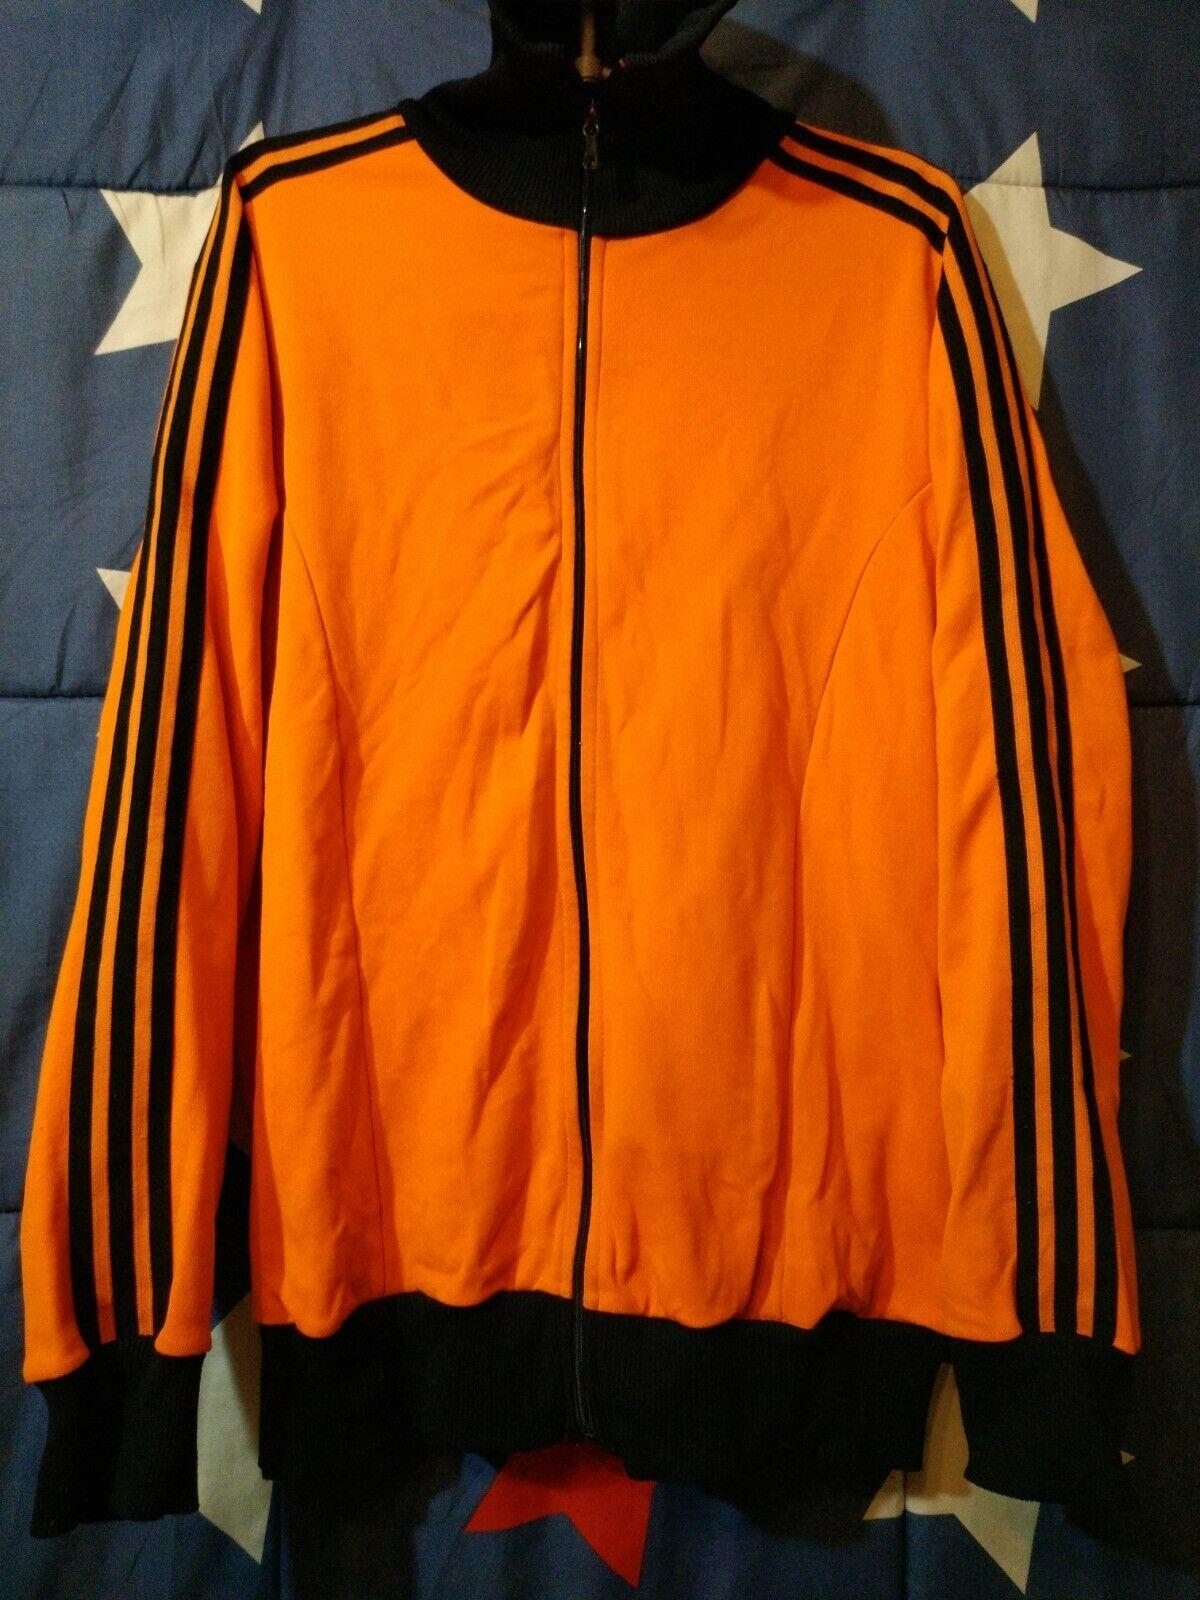 VINTAGE ADIDAS 1970s-1980s Orange TRAINING FOOTBALL JACKET (NETHERLANDS HOLLAND)